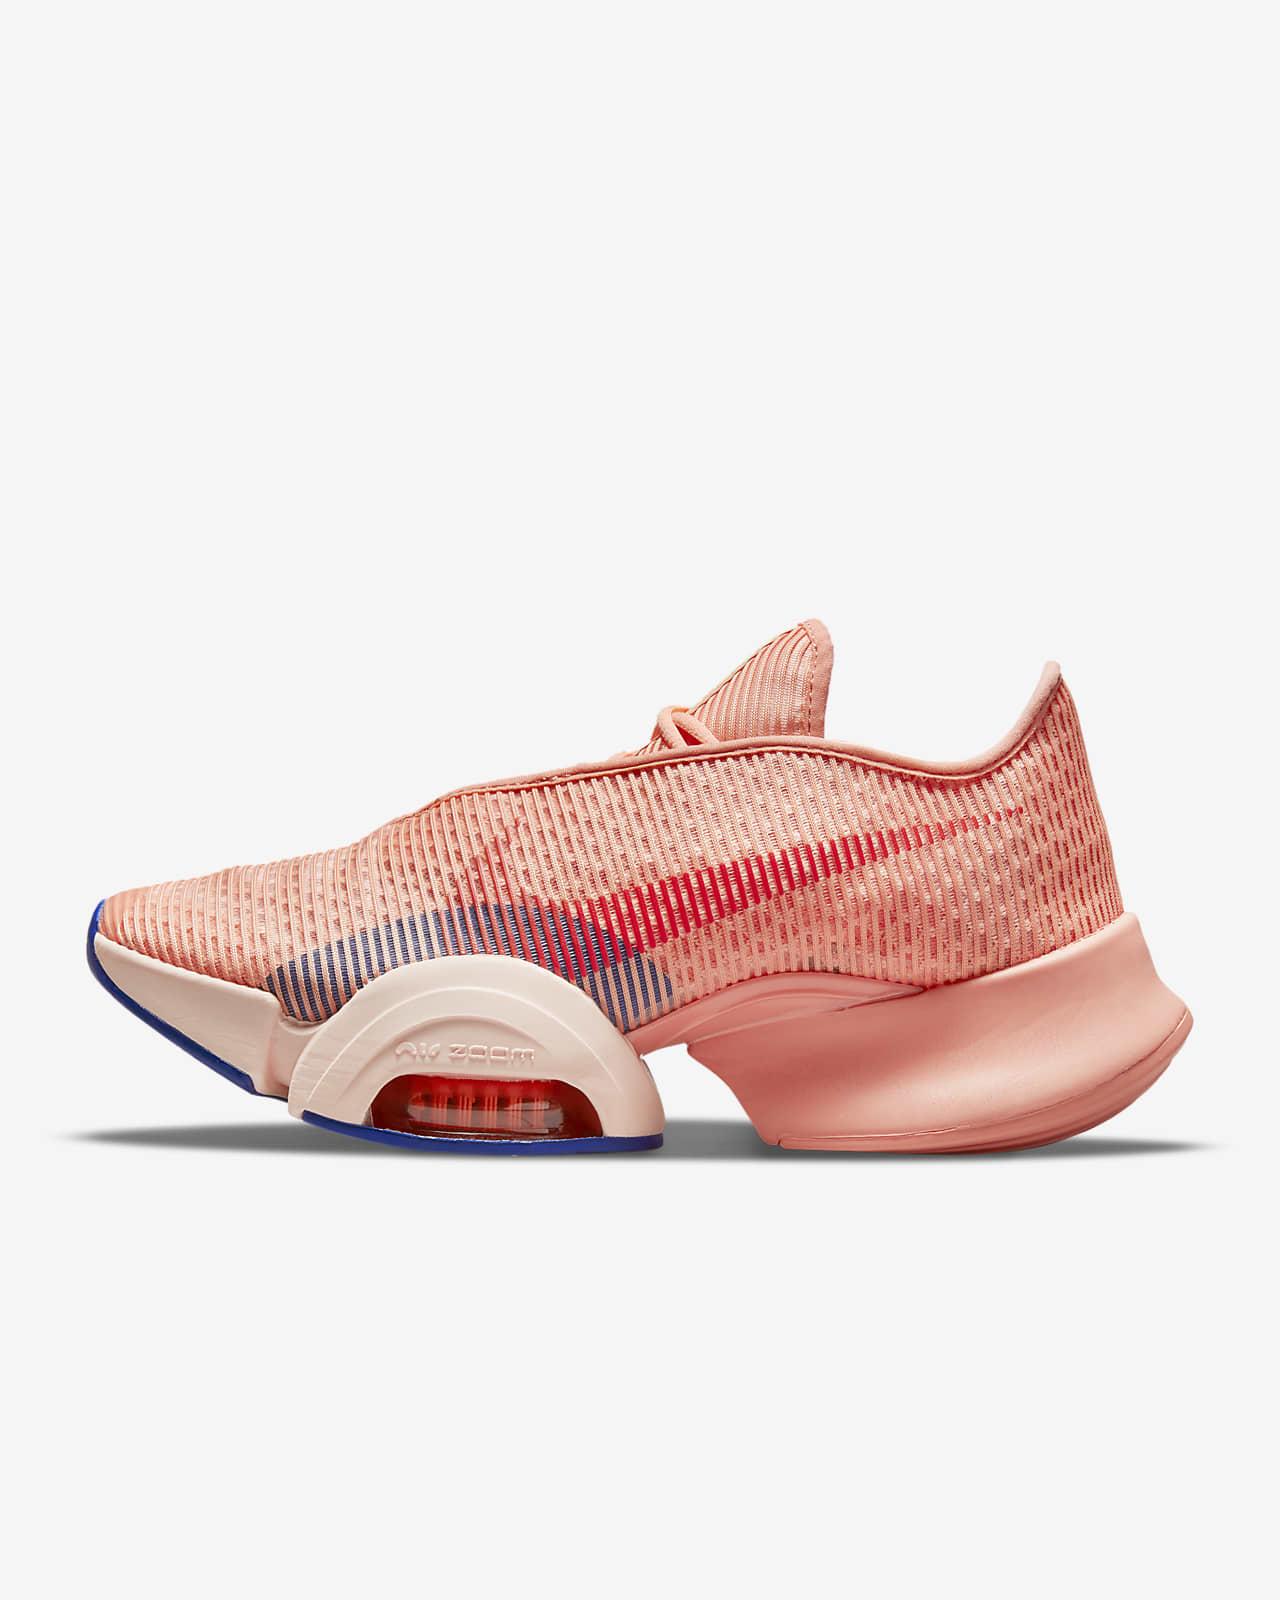 Sapatilhas de aulas de HIIT Nike Air Zoom SuperRep 2 para mulher